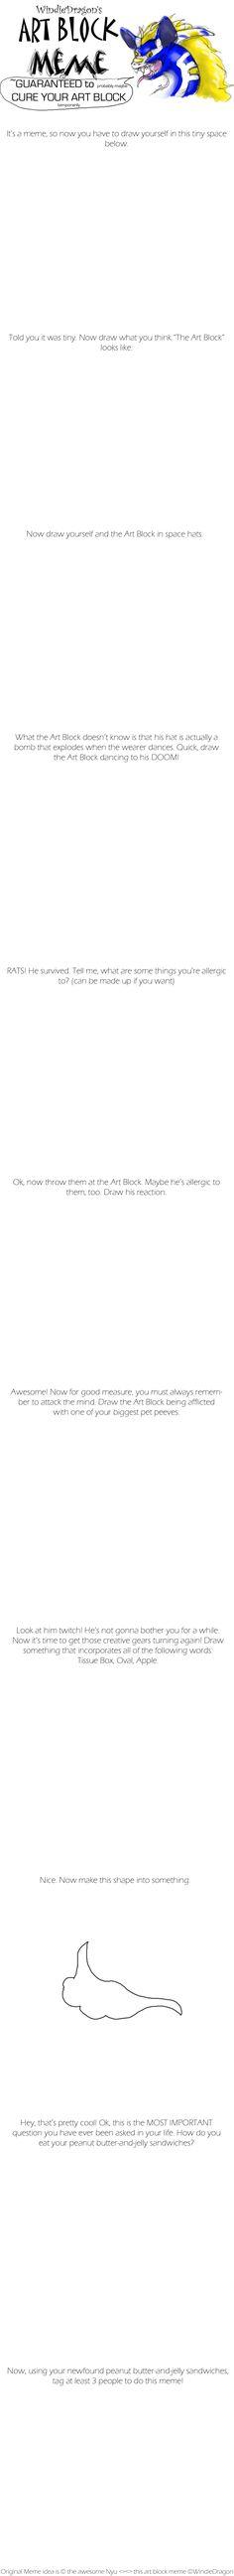 Art Block Meme Blank by WindieDragon.deviantart.com on @DeviantArt